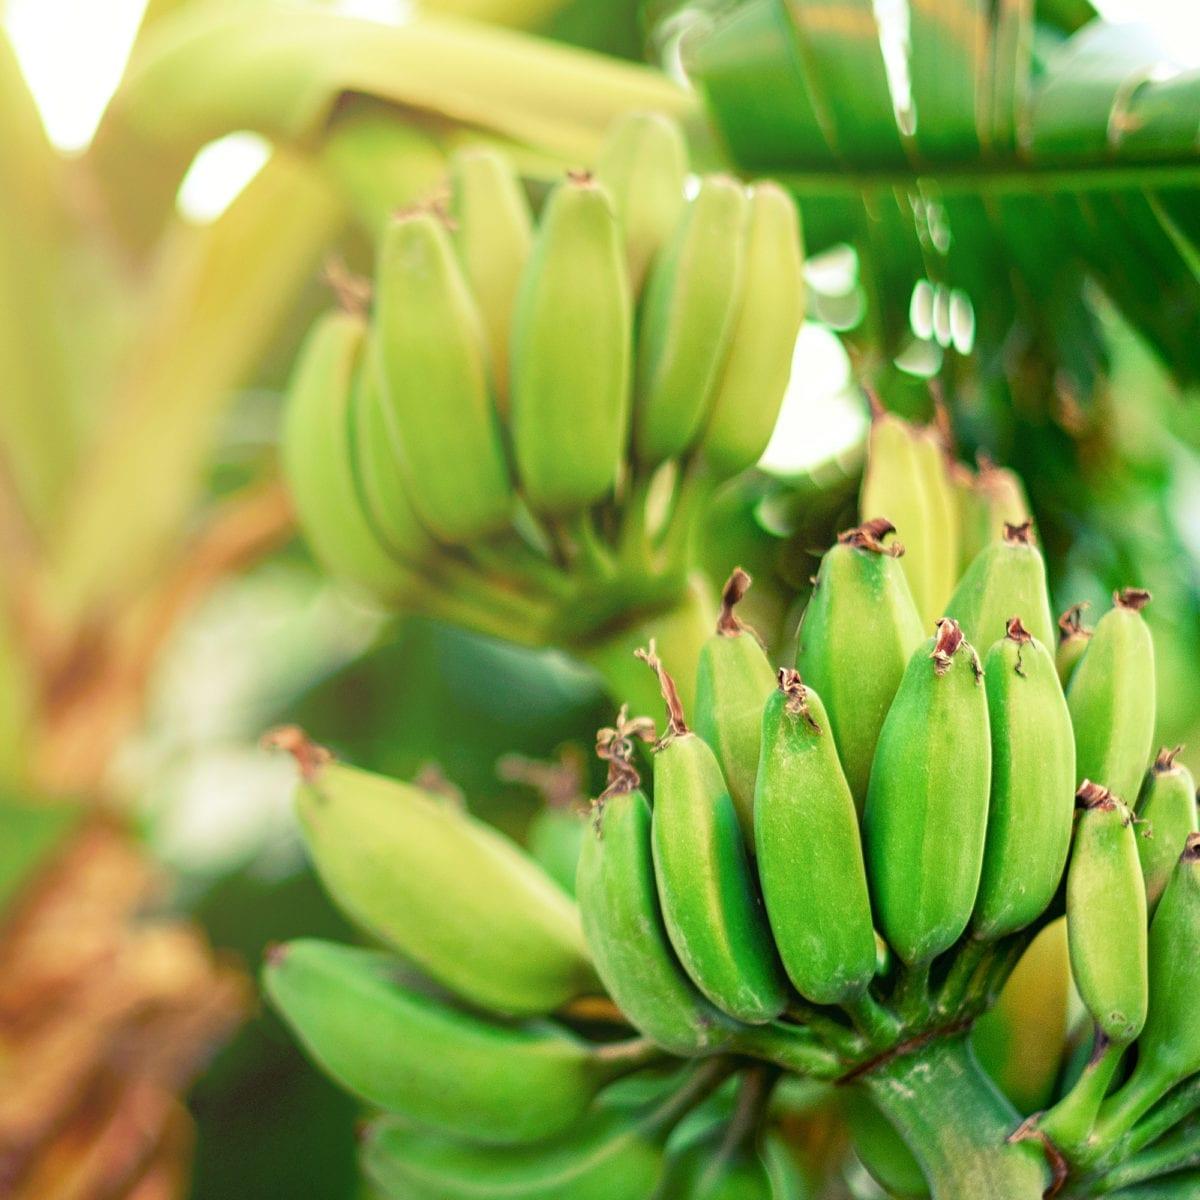 boskoopsefruitbomen | Bananenplant sfeerfoto